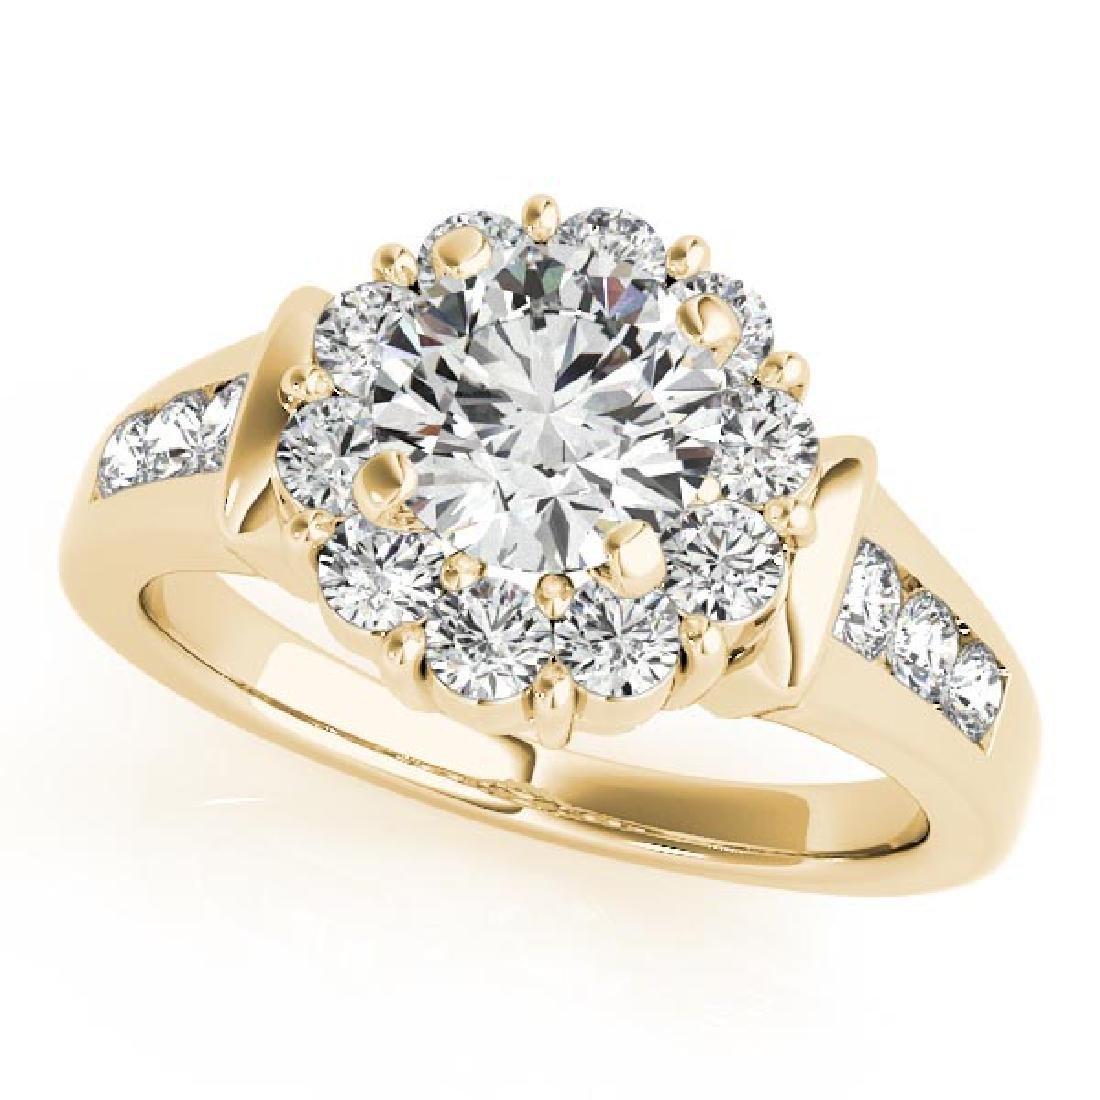 CERTIFIED 18K YELLOW GOLD 1.54 CT G-H/VS-SI1 DIAMOND HA